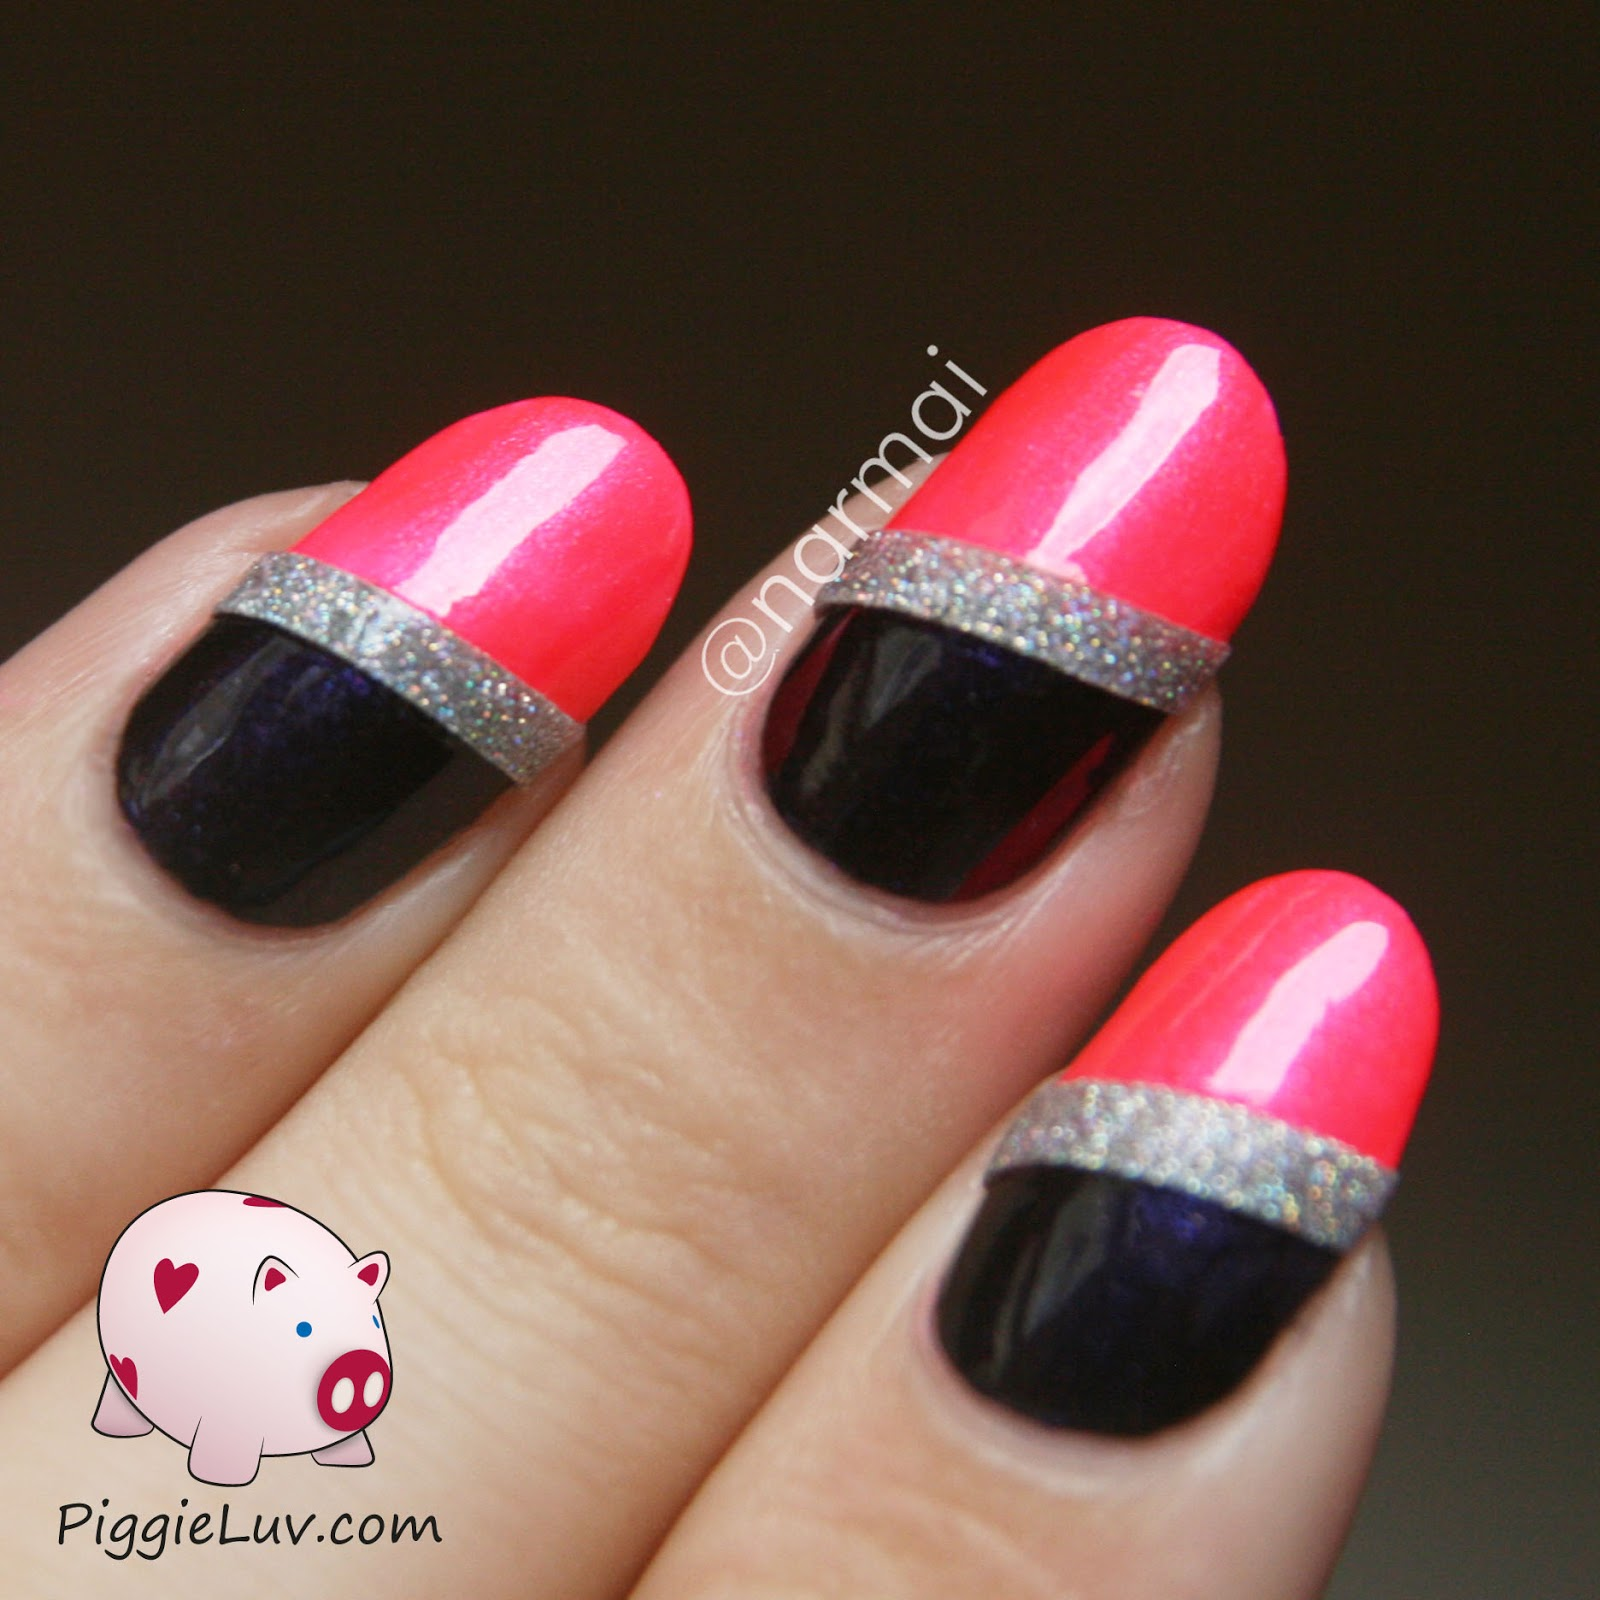 PiggieLuv: Chique neon nail art